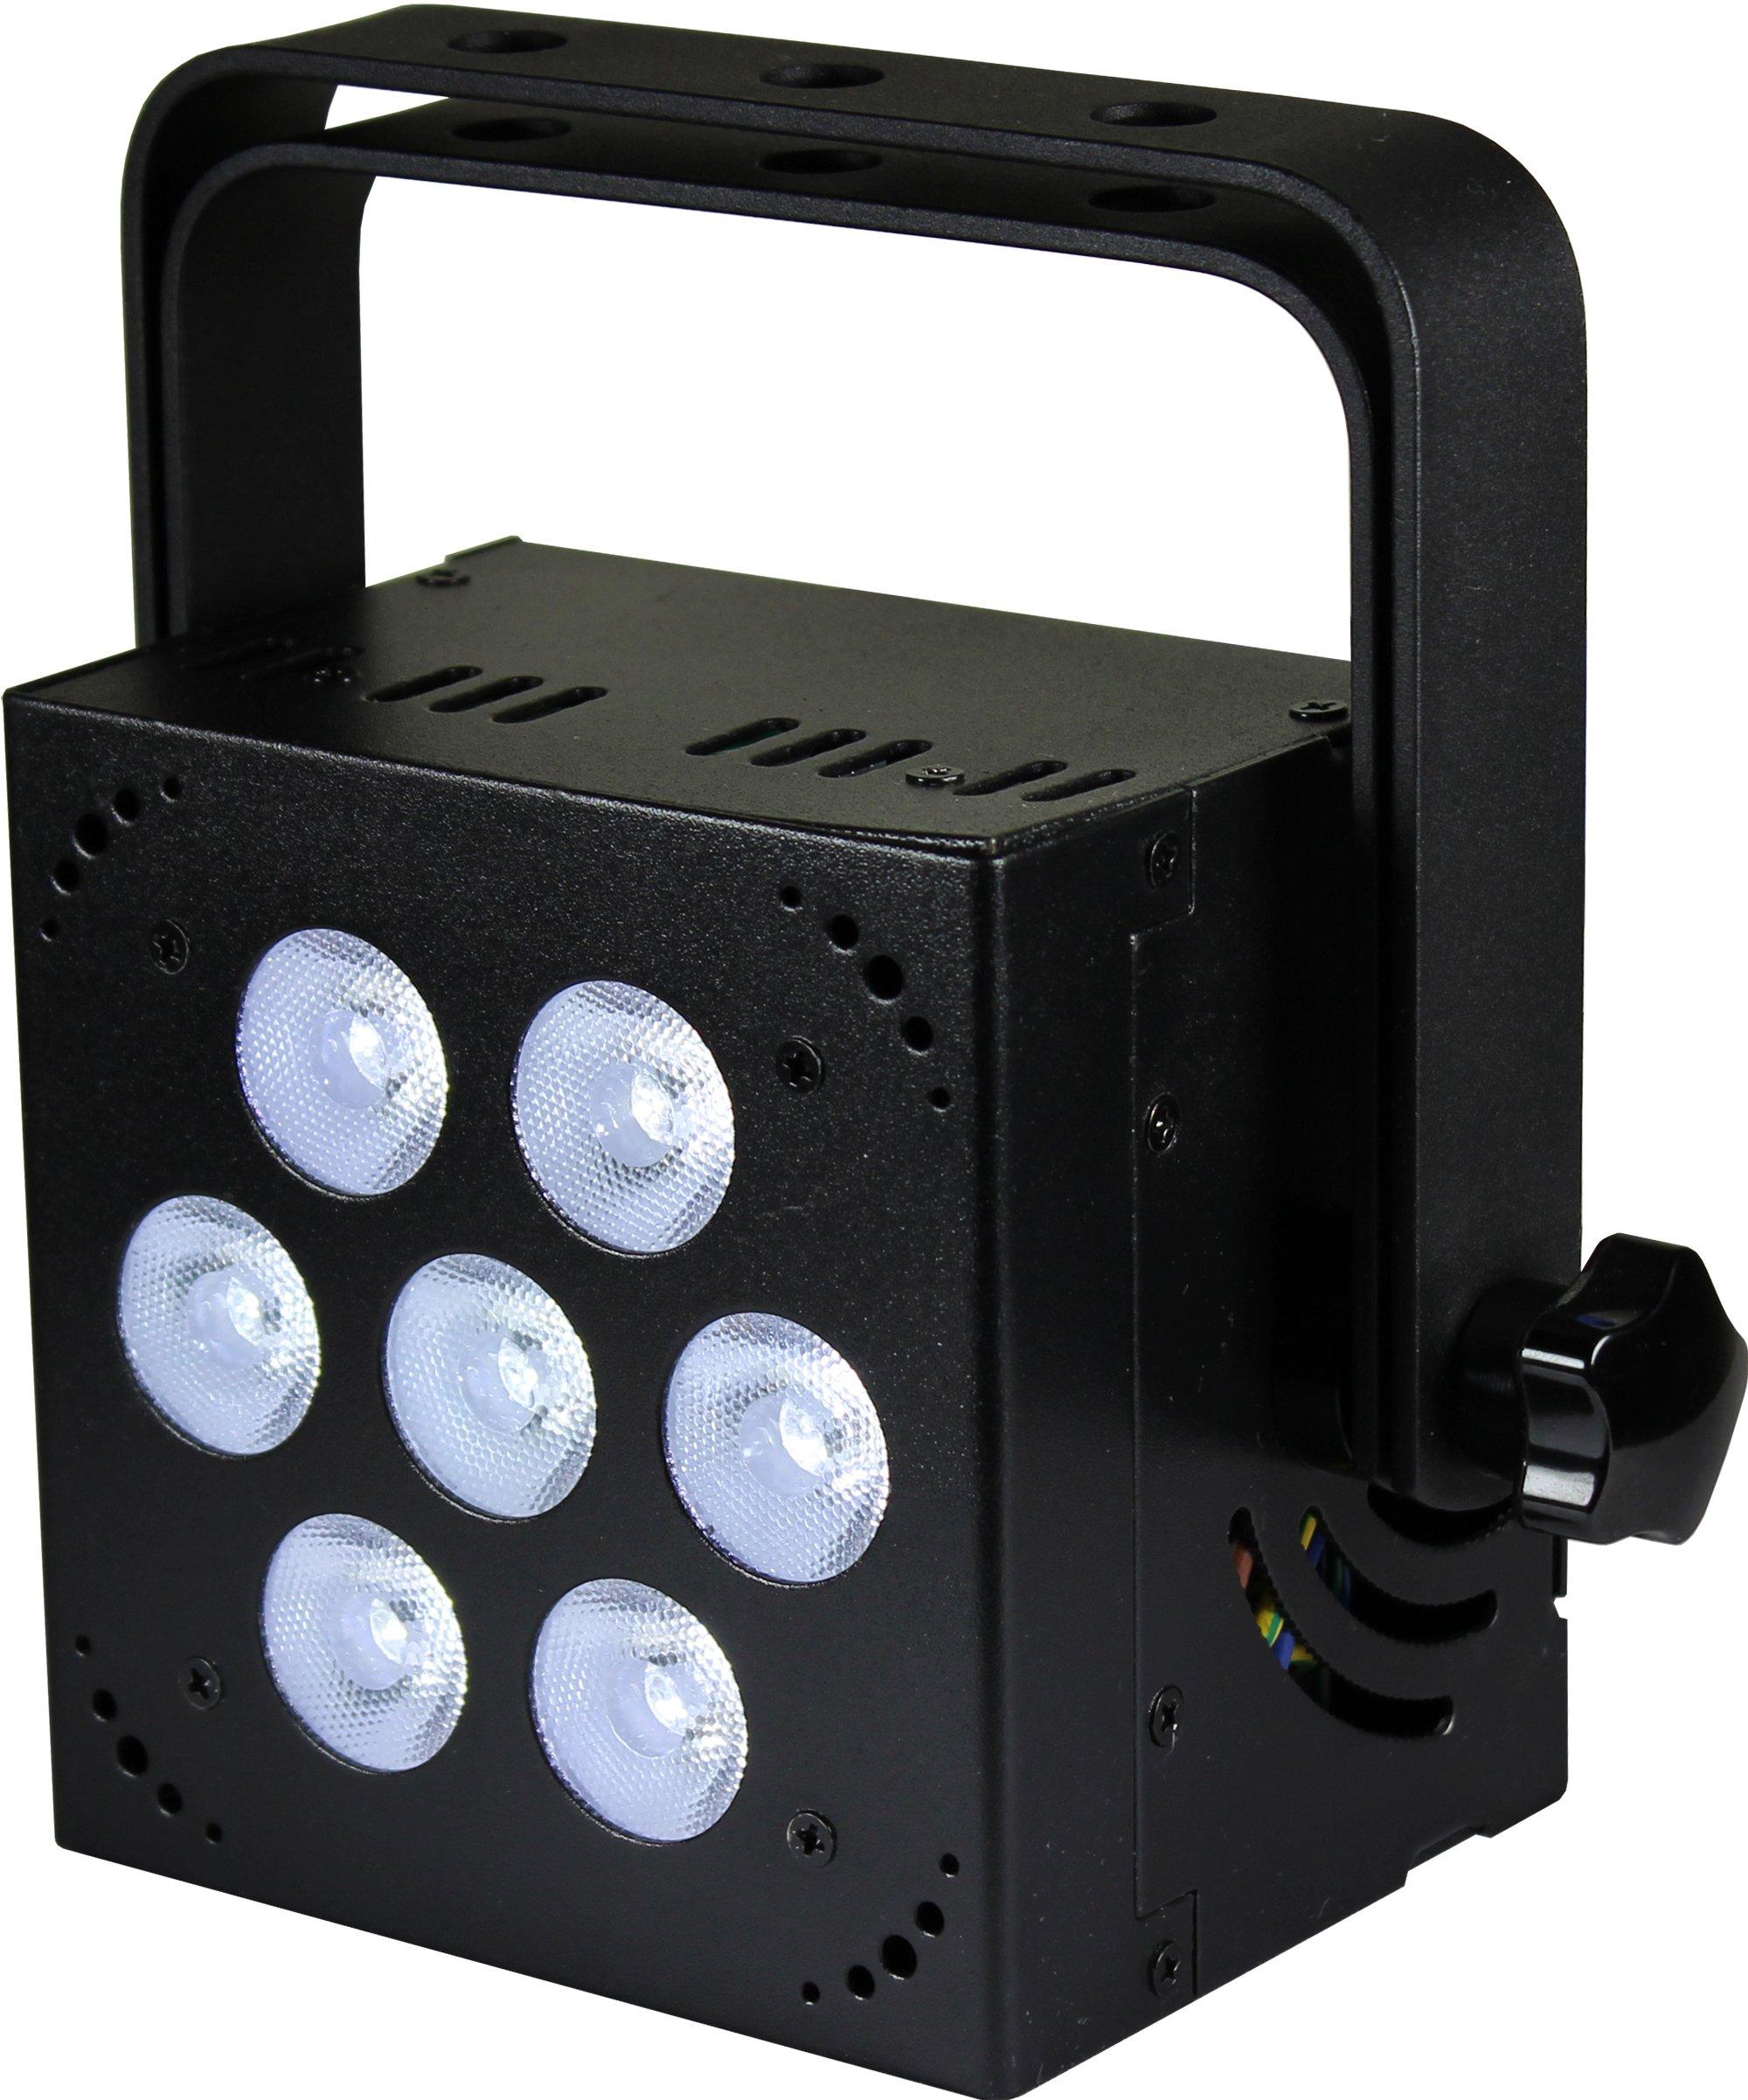 Blizzard Lighting HotBox 5 RGBAW Stage Light Unit